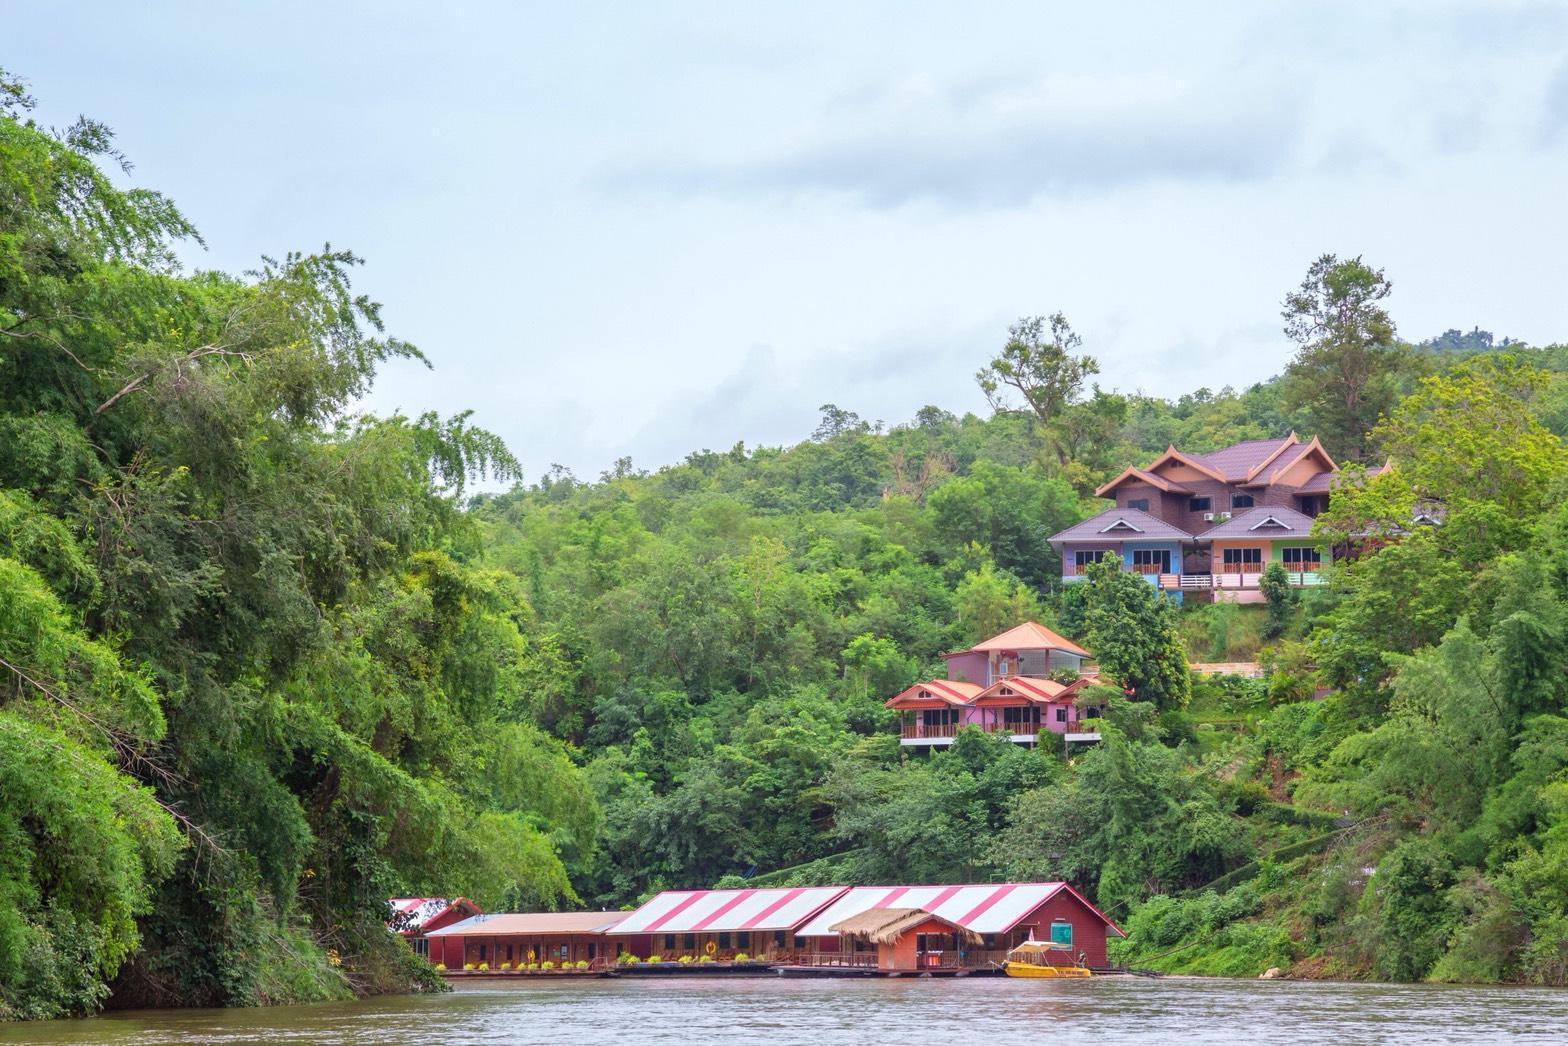 Star Hill River Kwai Resort สตาร์ฮิลล์ ริเวอร์แคว รีสอร์ท